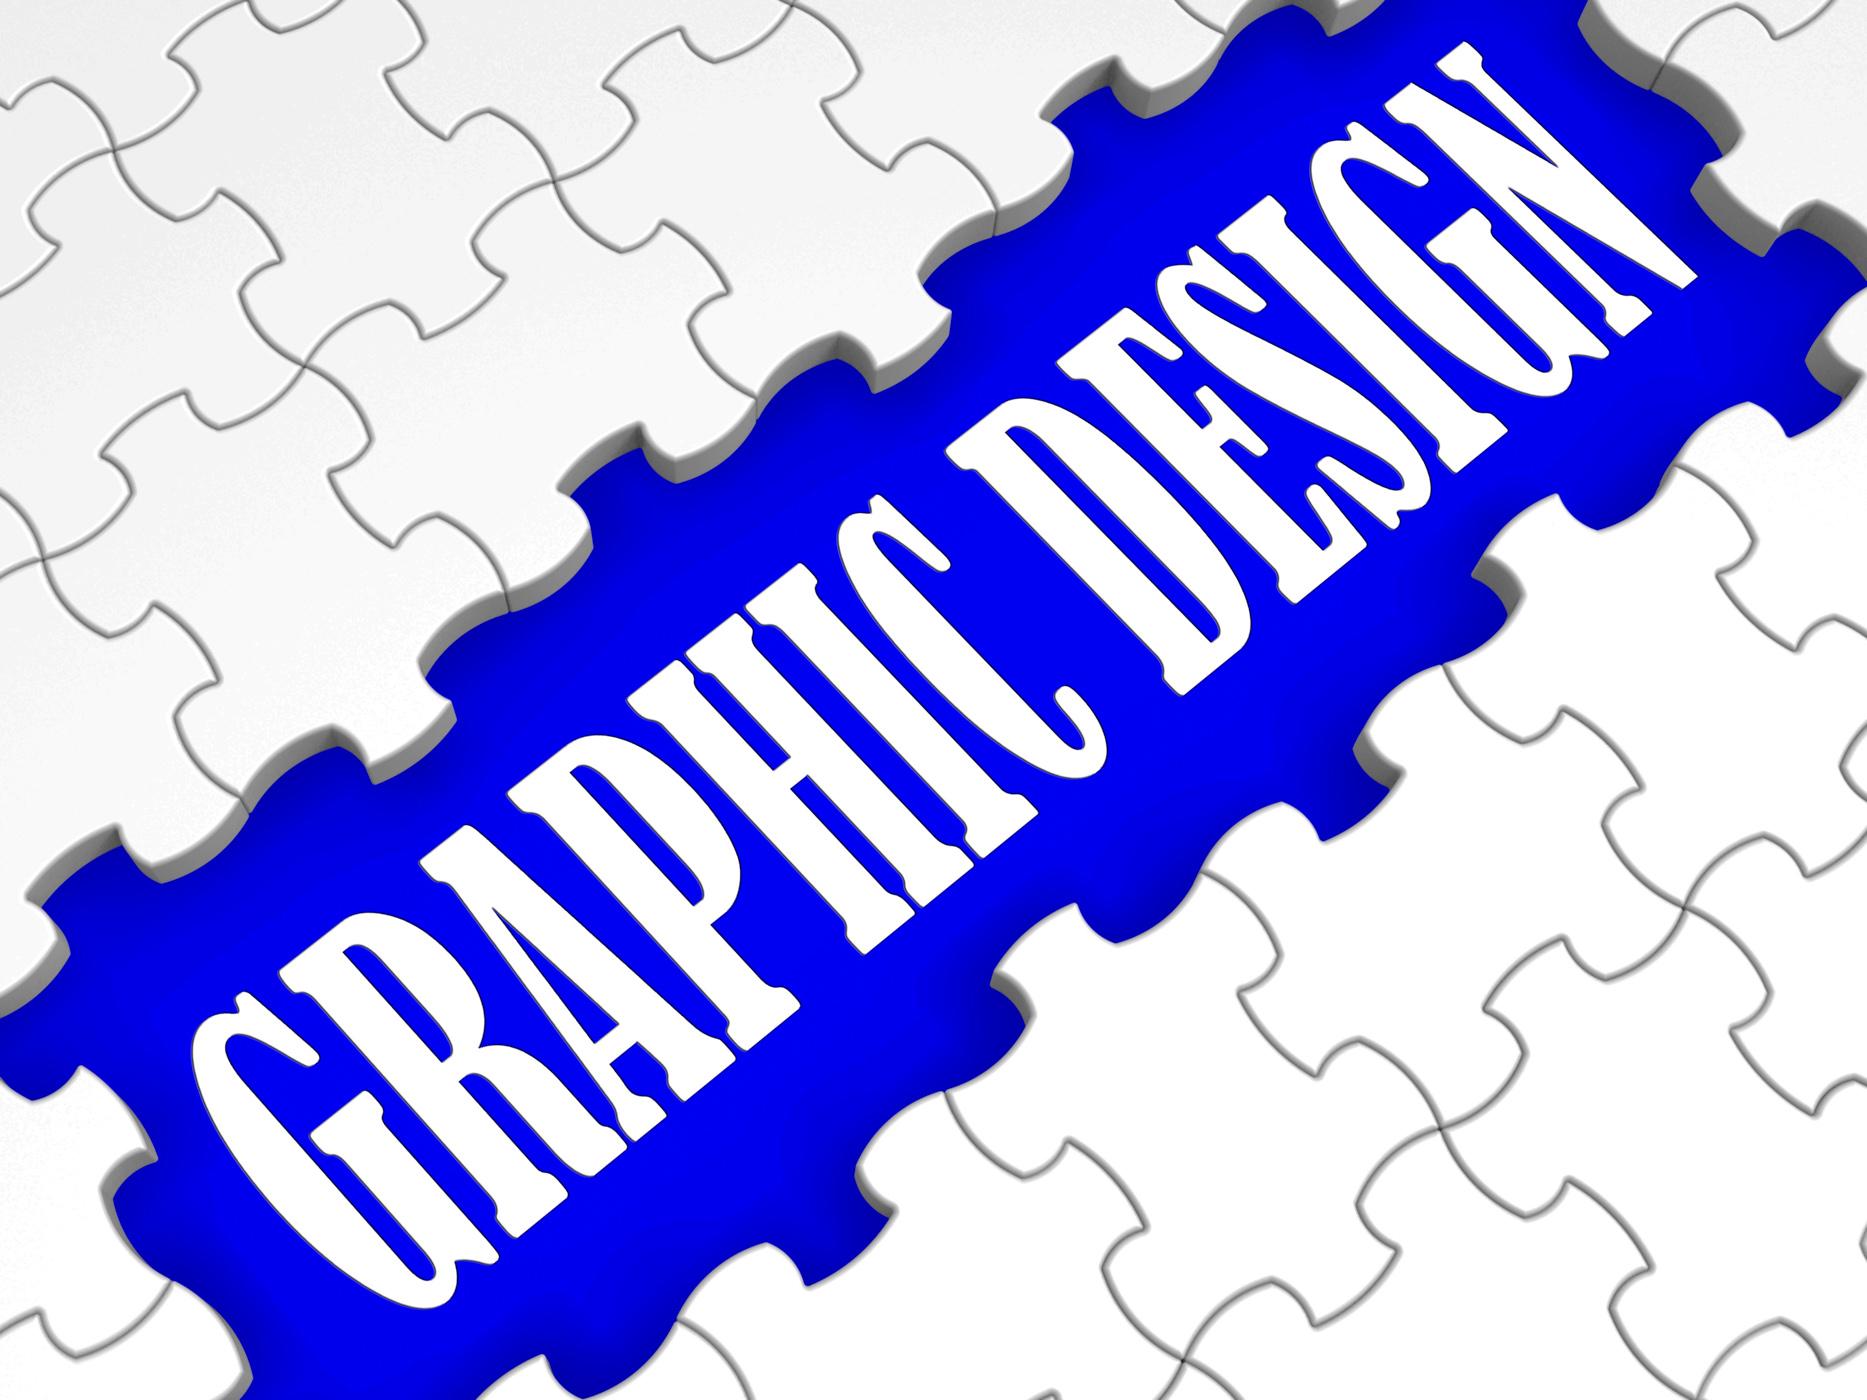 Graphic design puzzle shows digital creativity photo